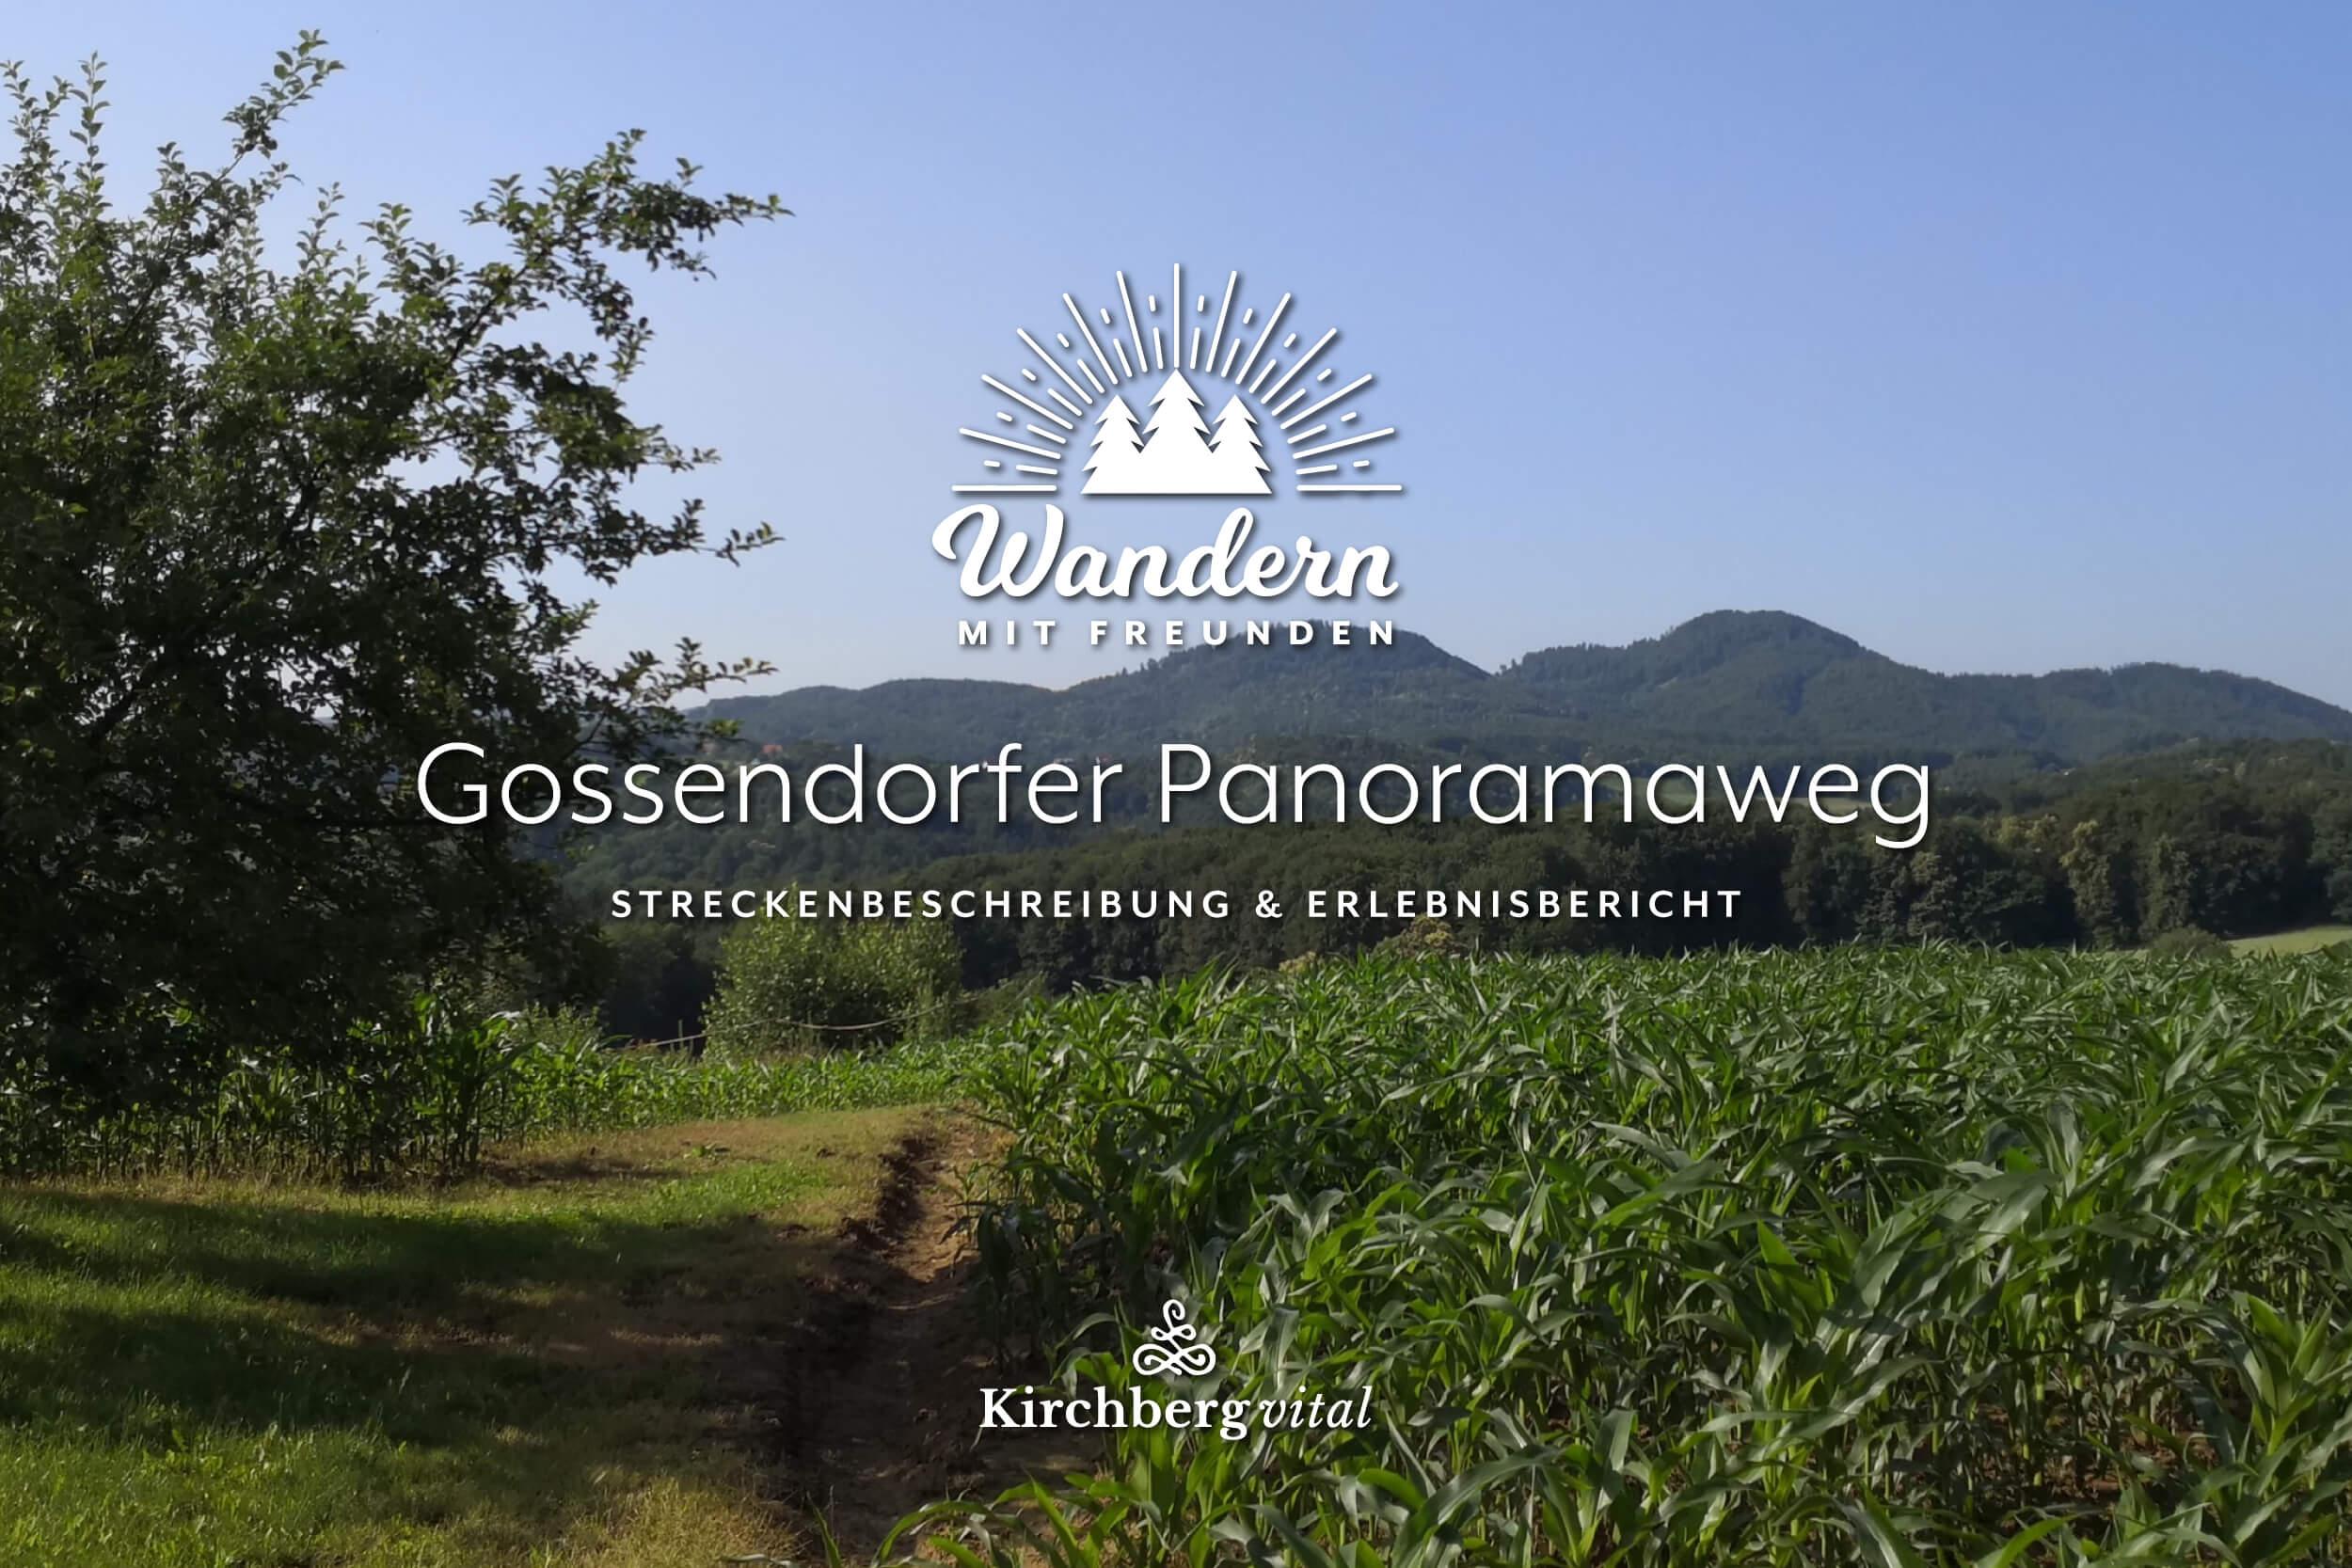 Gossendorf-L_BANNER.jpg